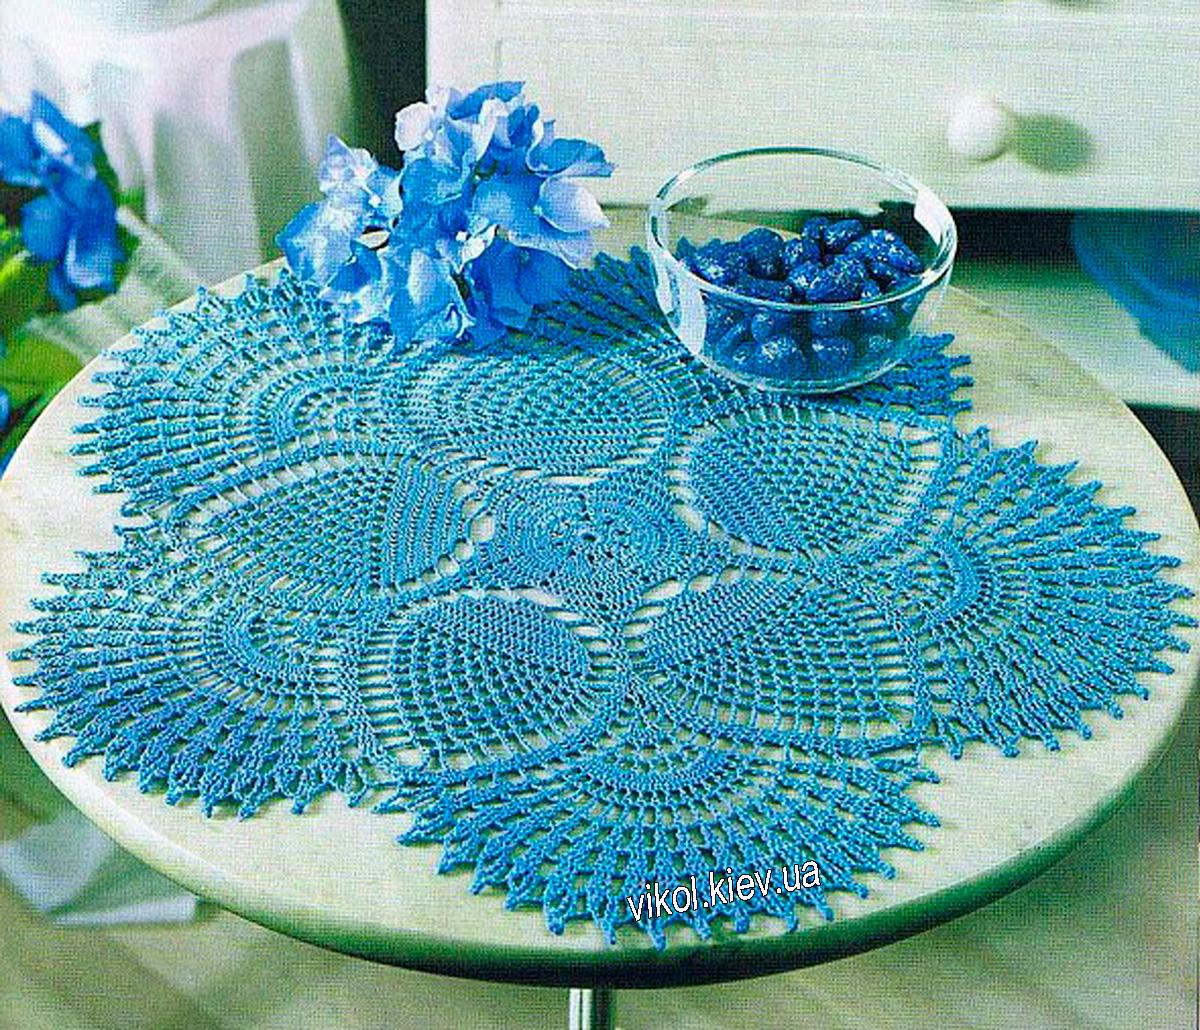 синяя салфетка крючком, круглые синие салфетки, вязание синих салфеток